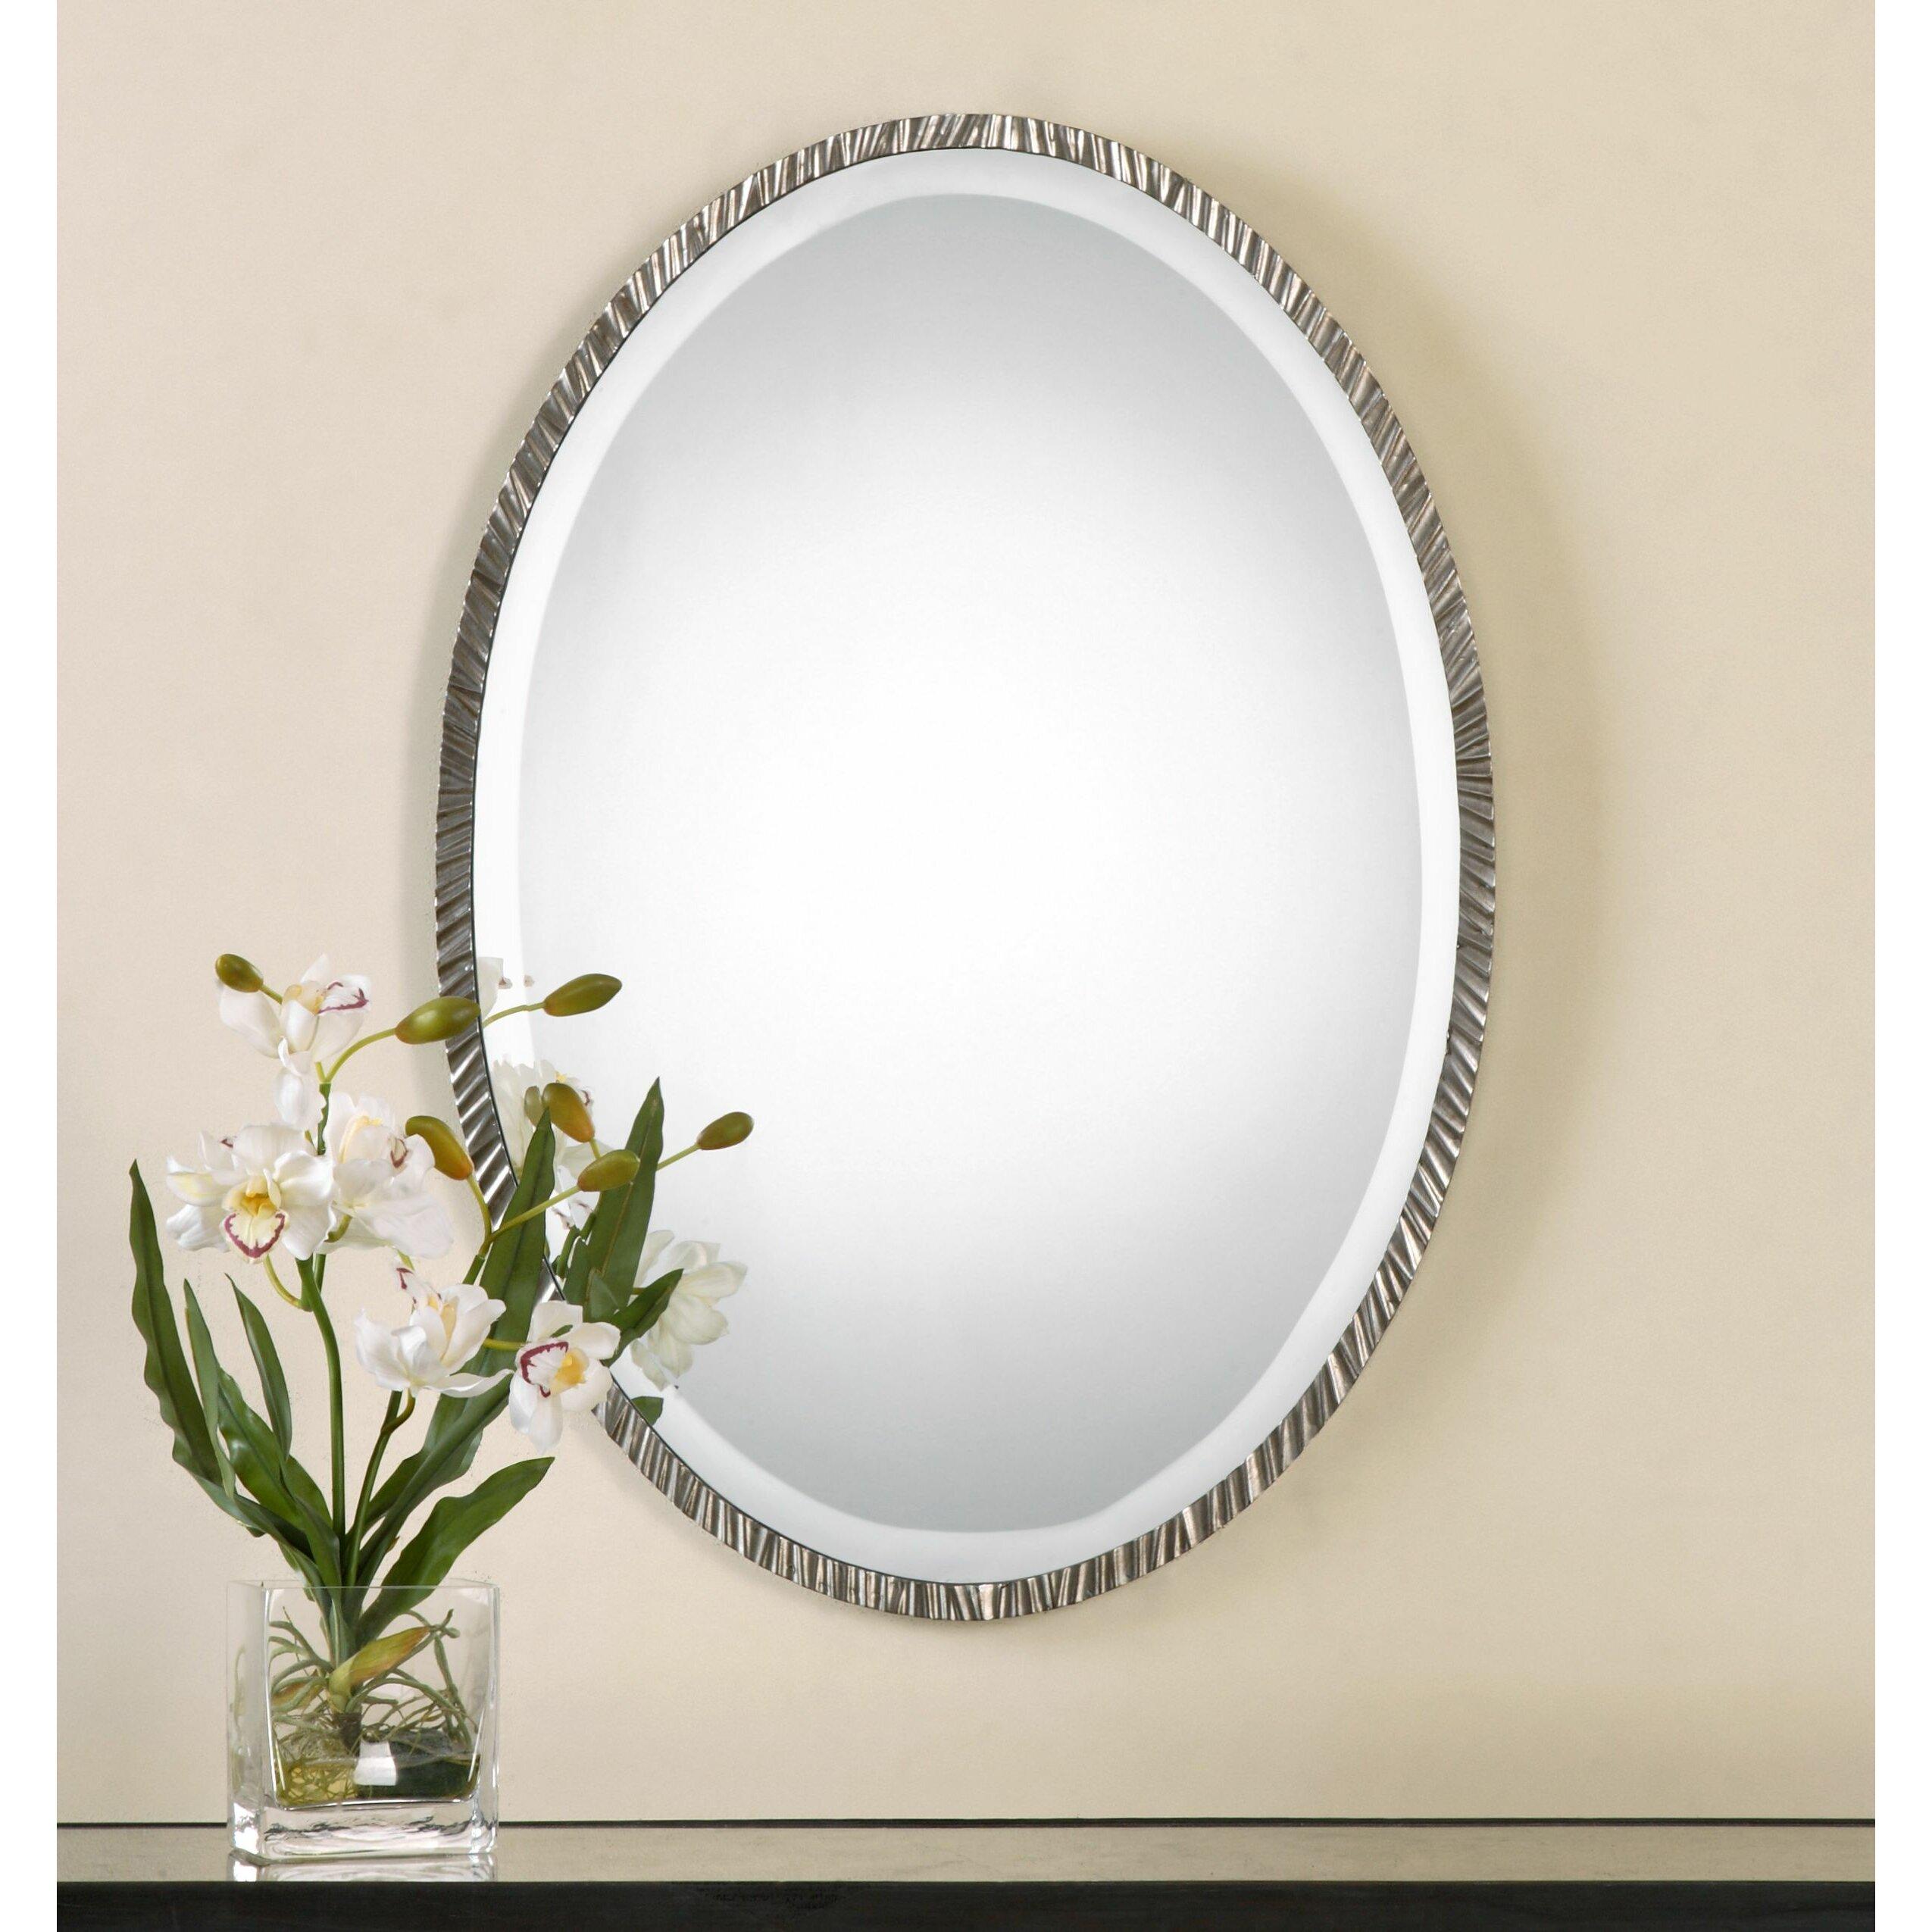 Vivian Wall Mirror By Uttermost: Uttermost Annadel Oval Wall Mirror & Reviews